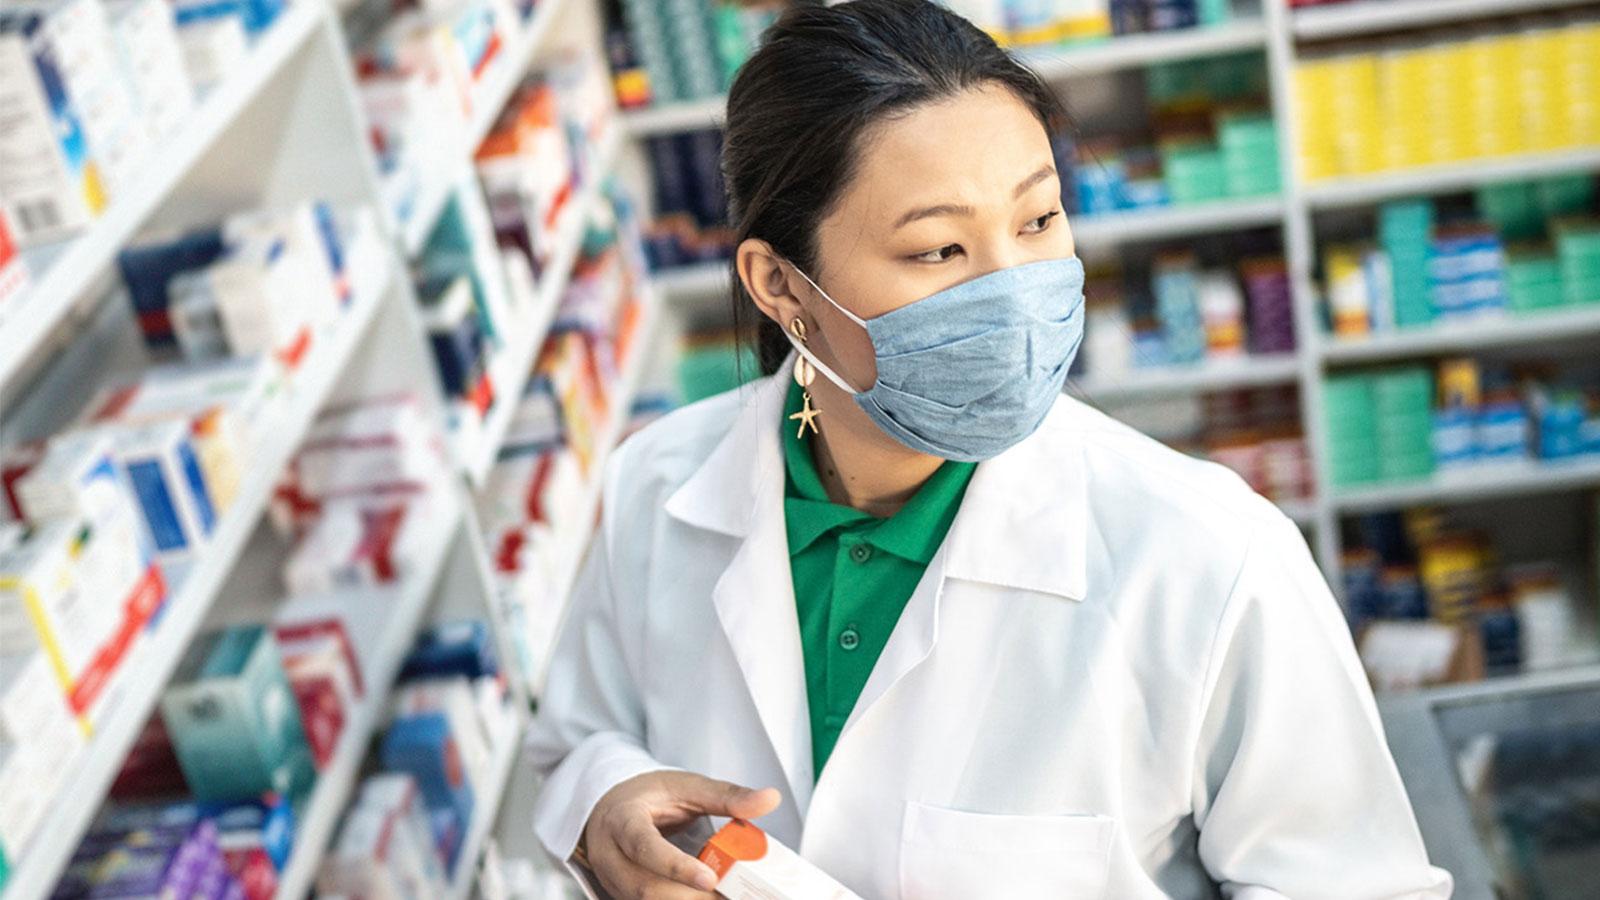 Pharmacist-gazing